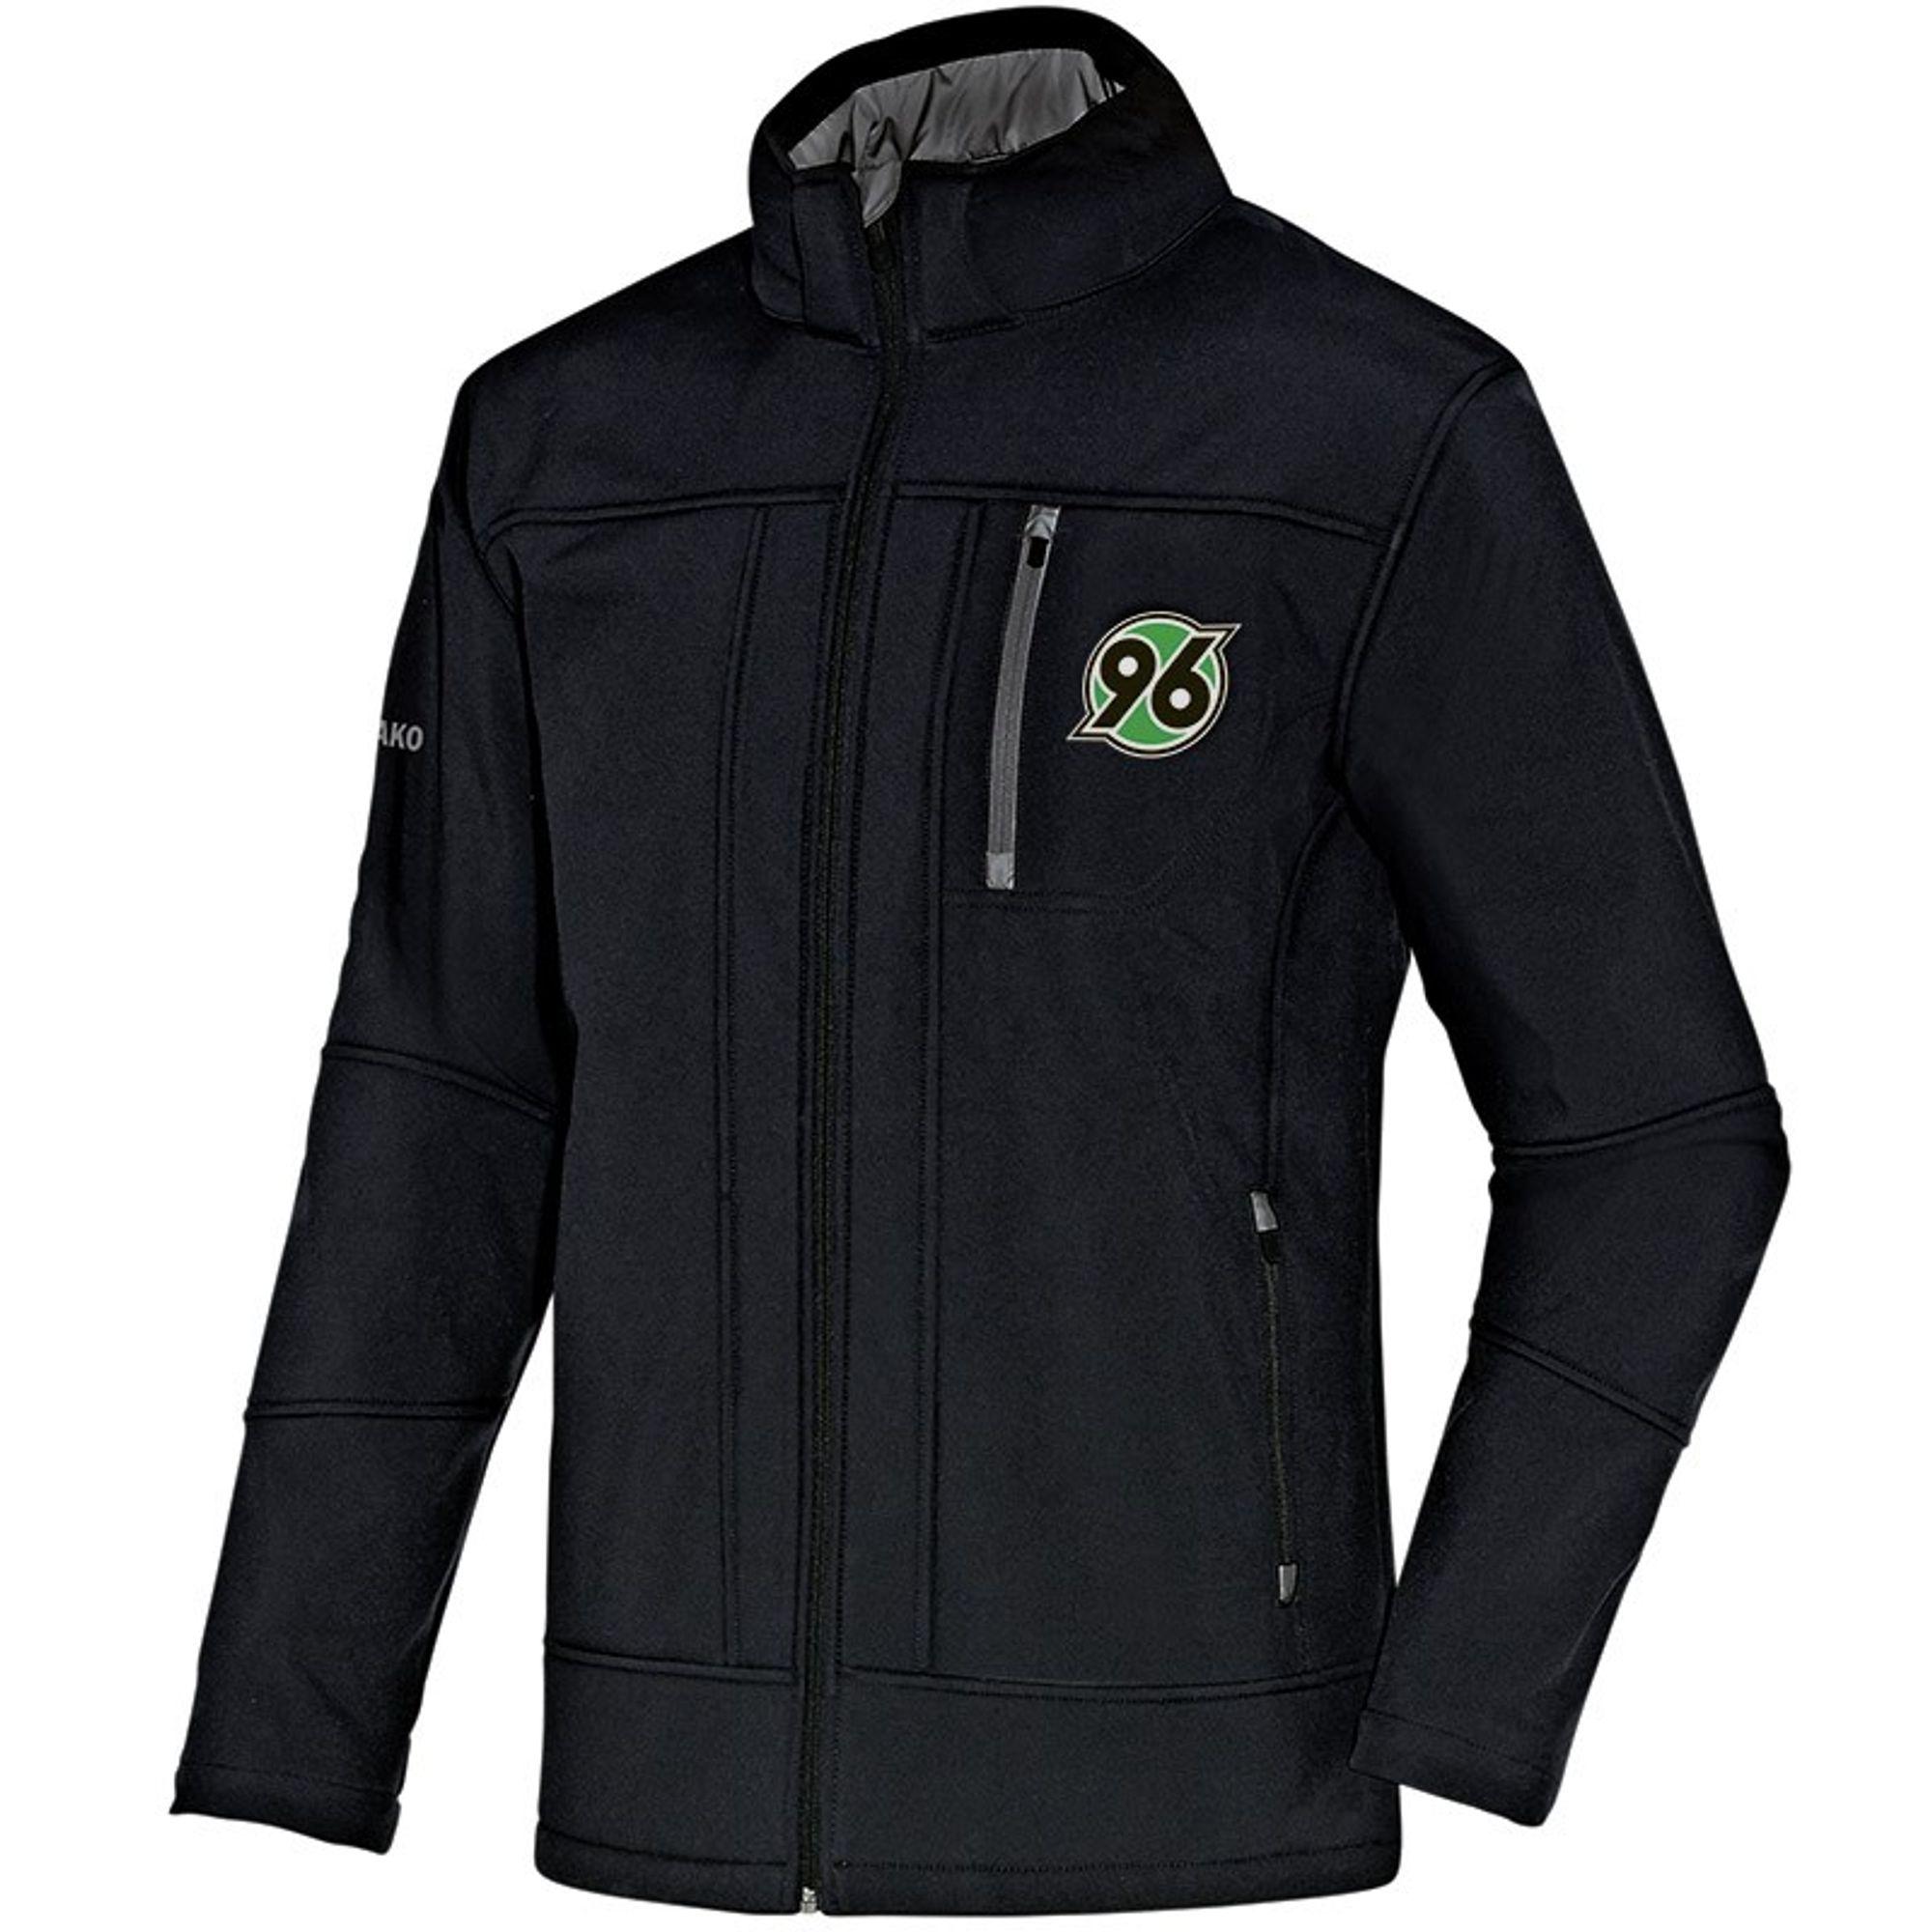 Jako Hannover 96 Softshelljacke Team Saison 2015/2016 - schwarz